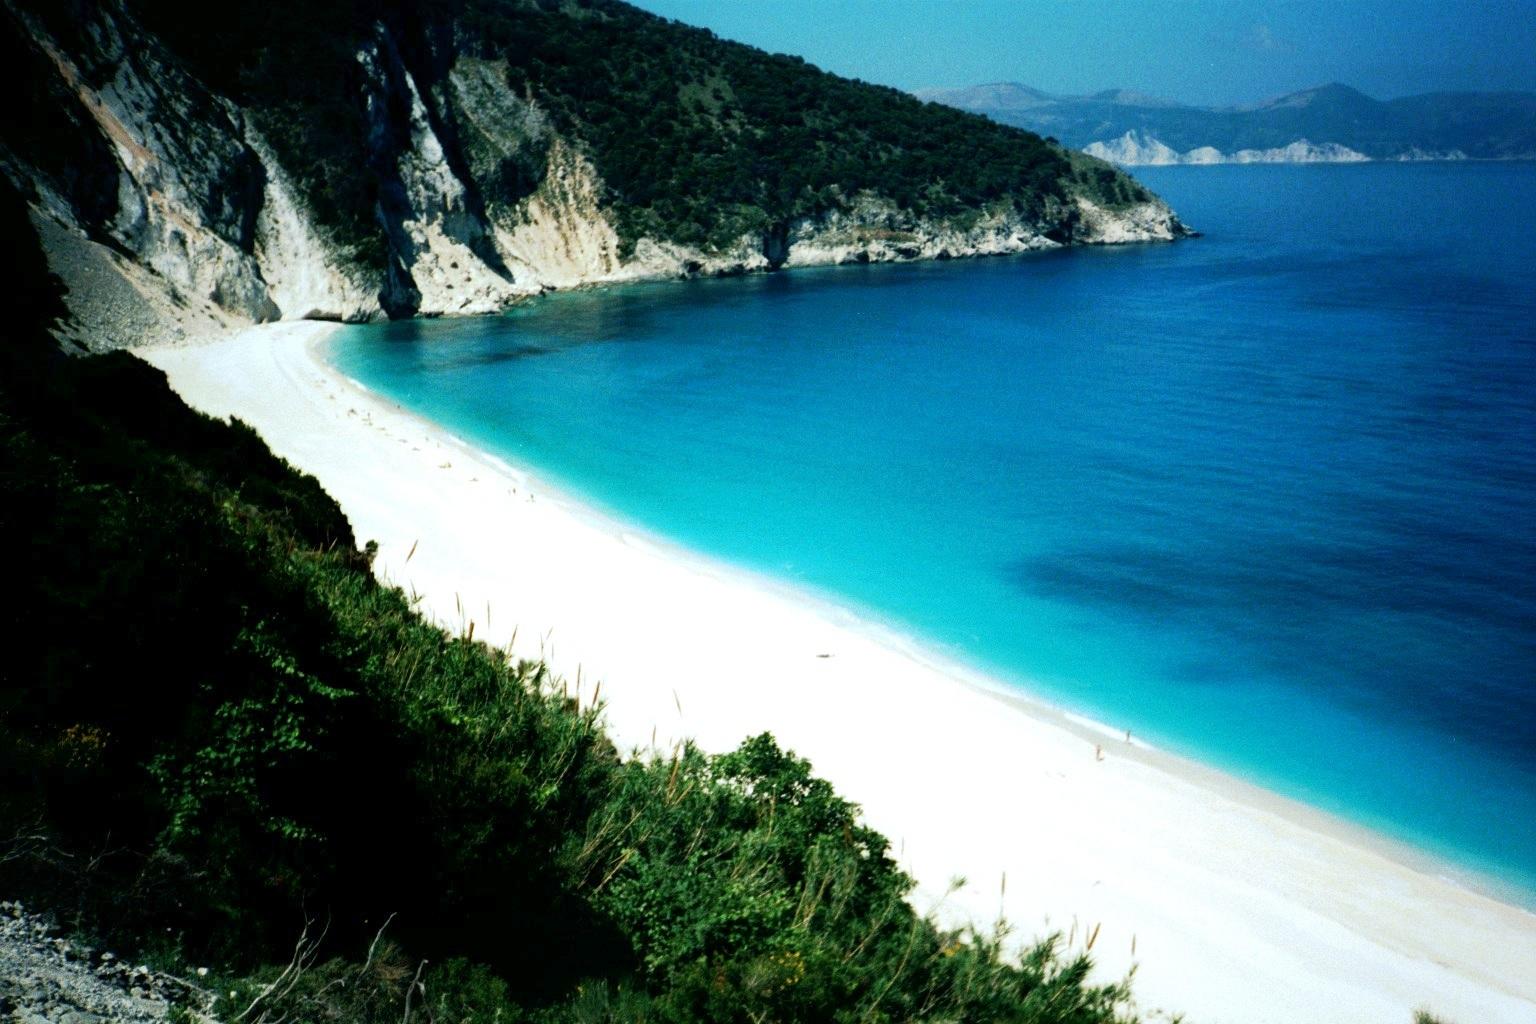 Kefalonia beaches vids images 15